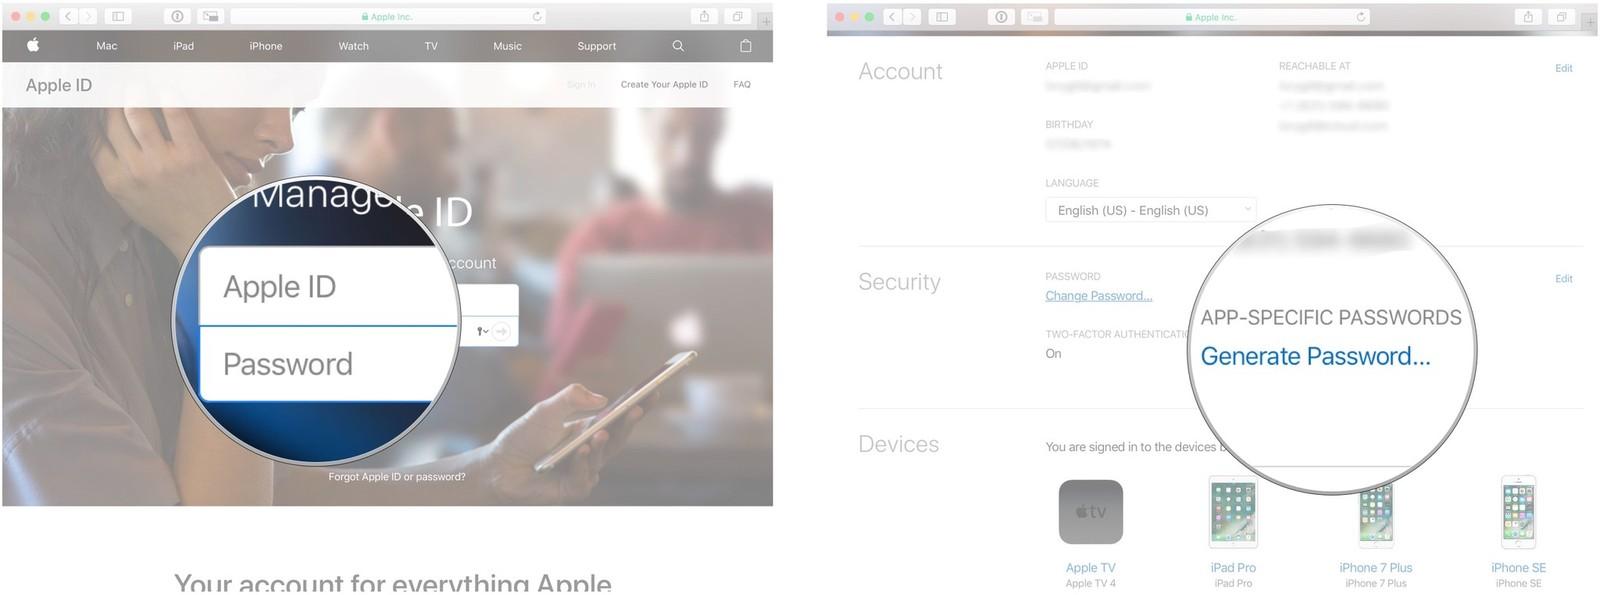 generate-app-specific-password-01.jpg